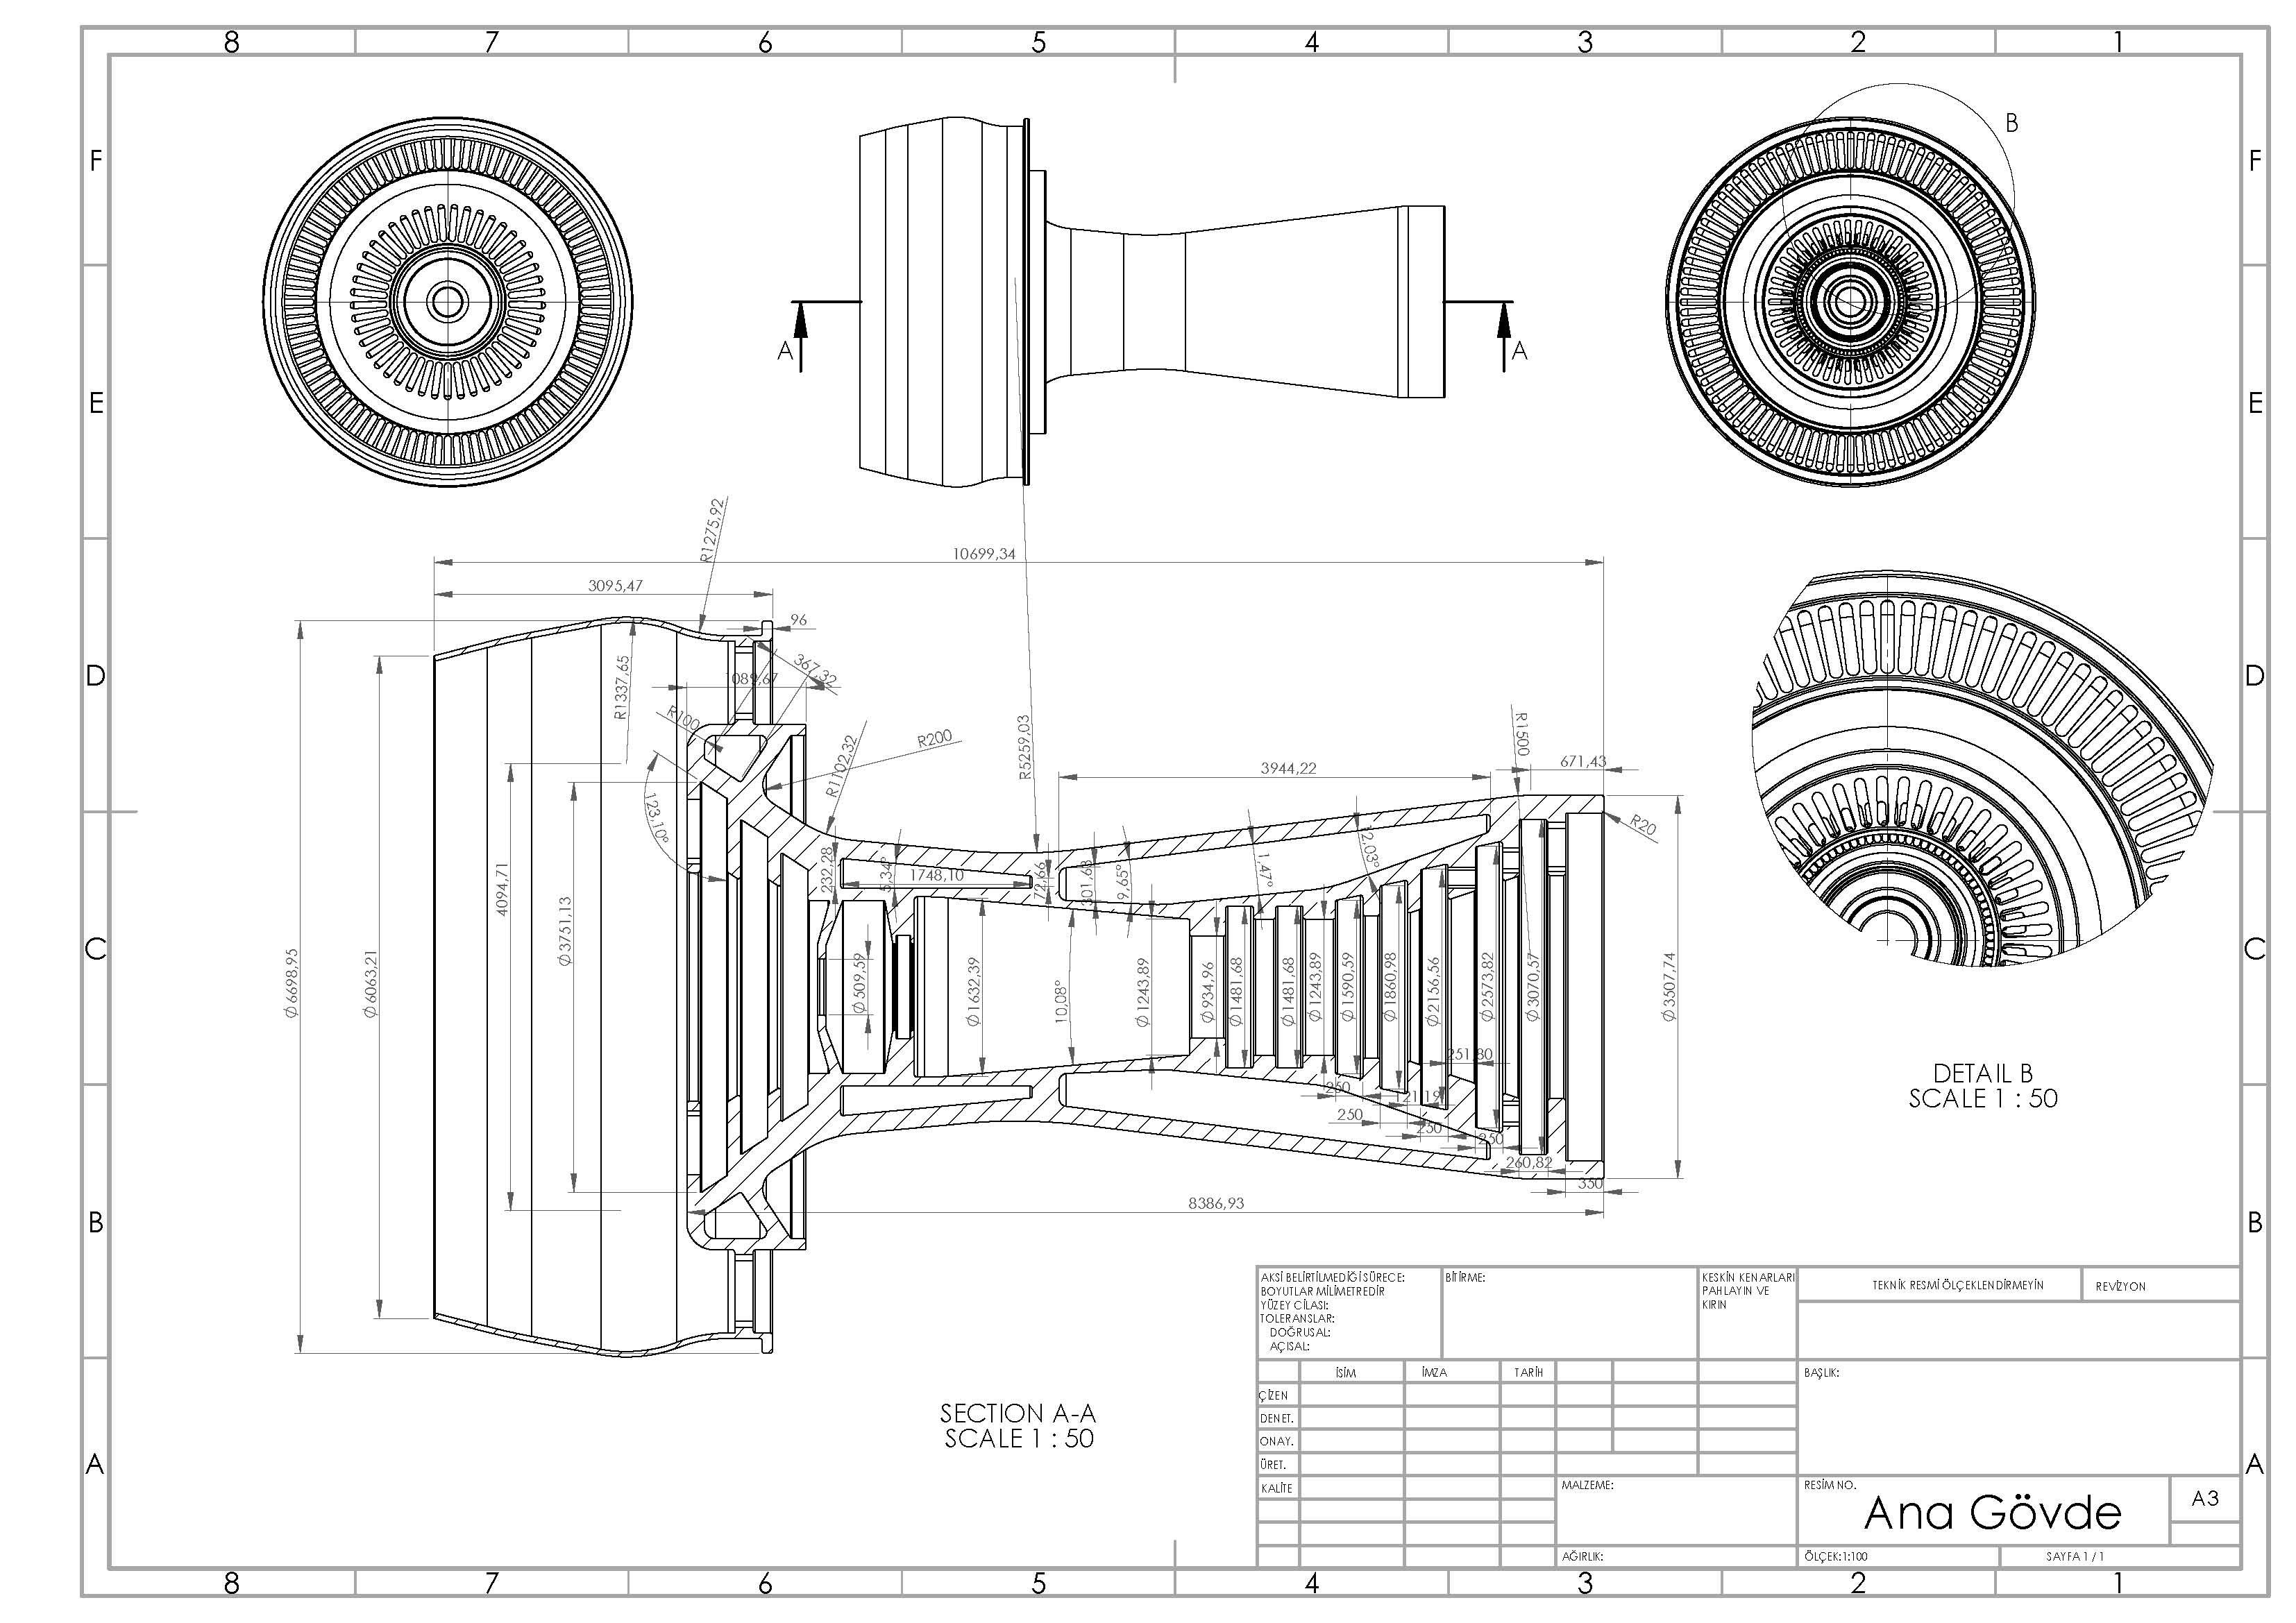 Gas Turbine Engine燃气轮机发动机概念模型3D图纸 Solidworks